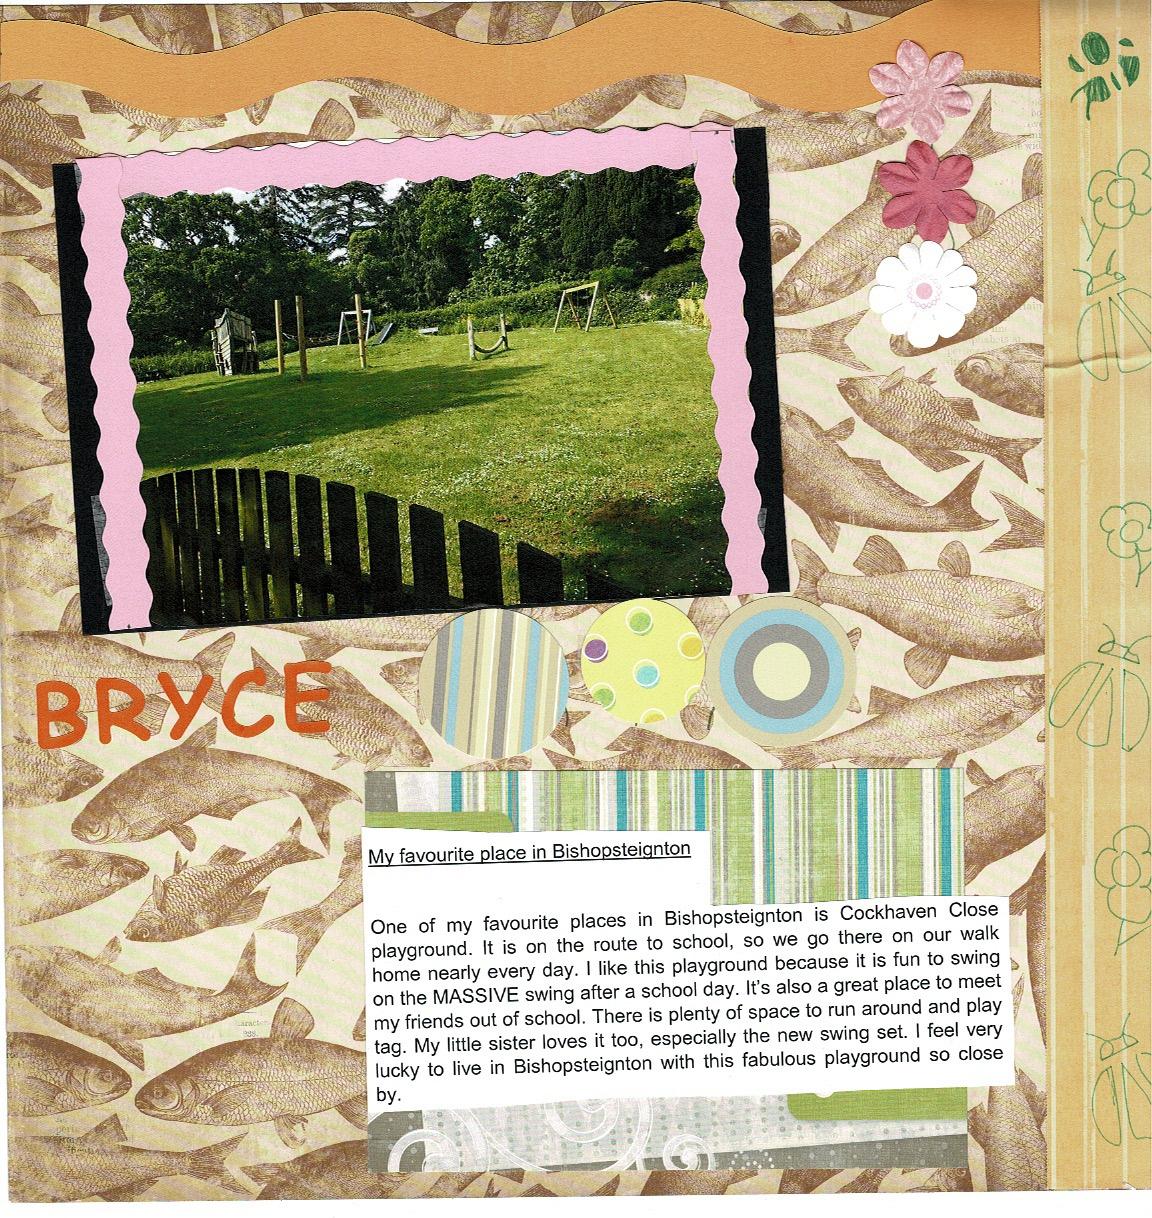 Bryce